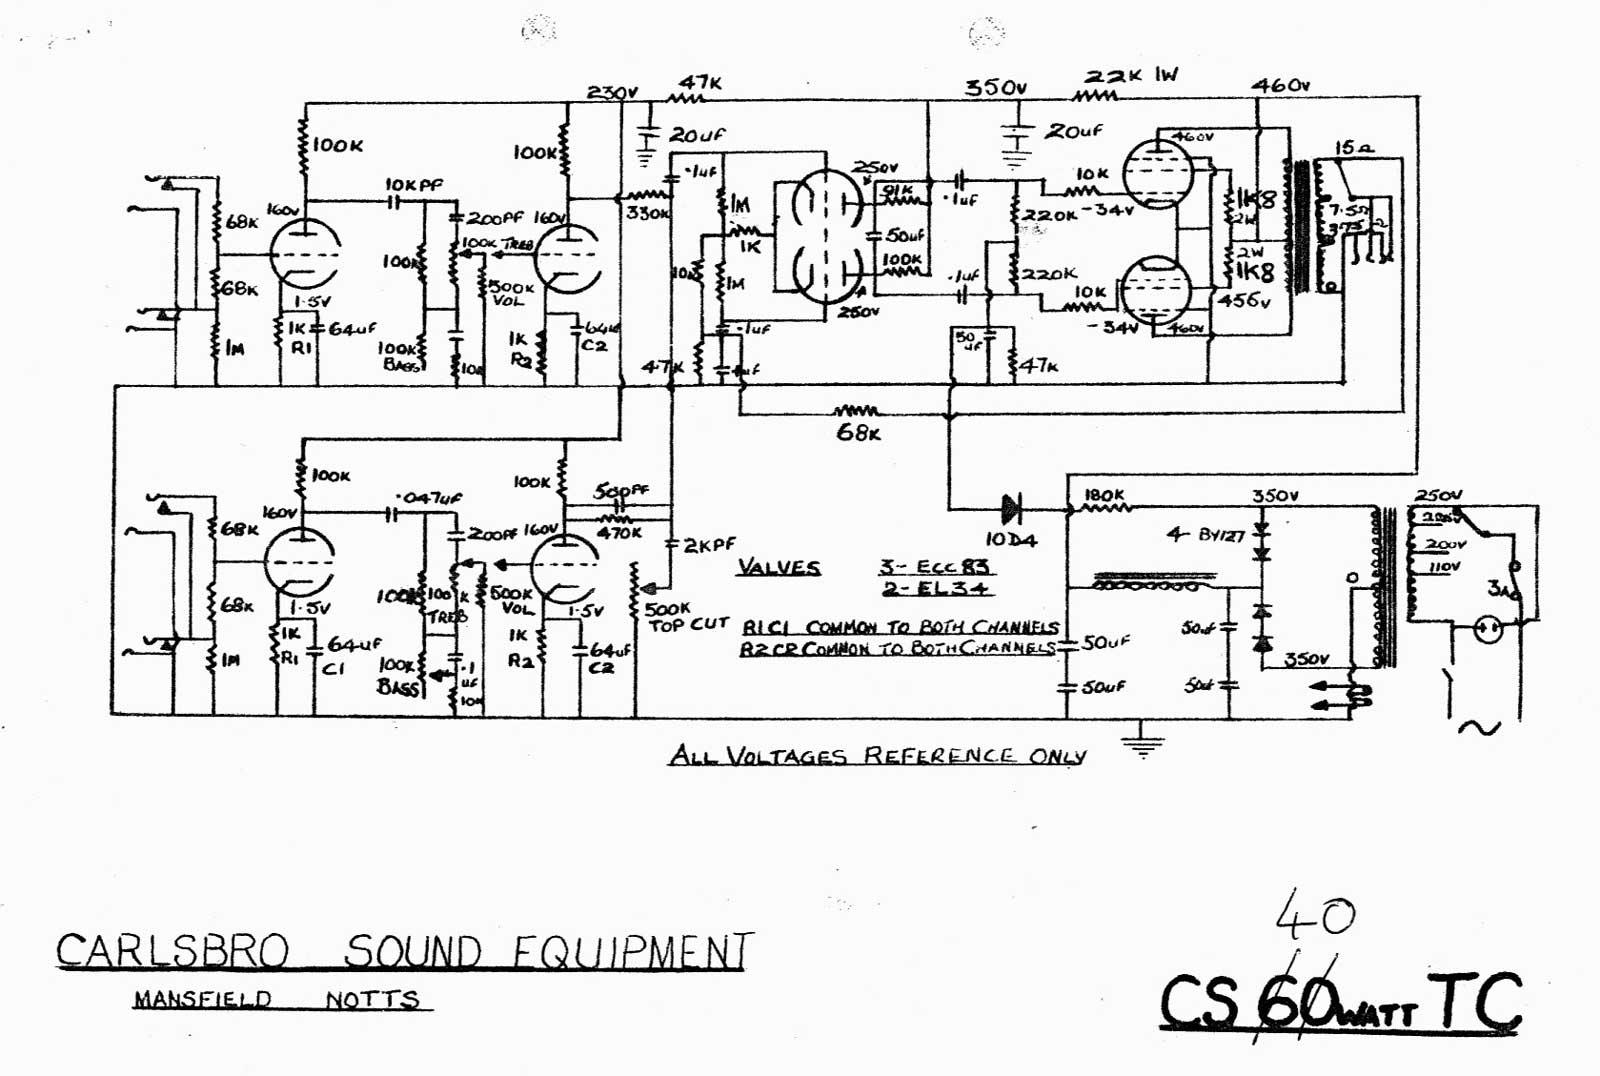 Carlsbro 40tc Amp Schematic